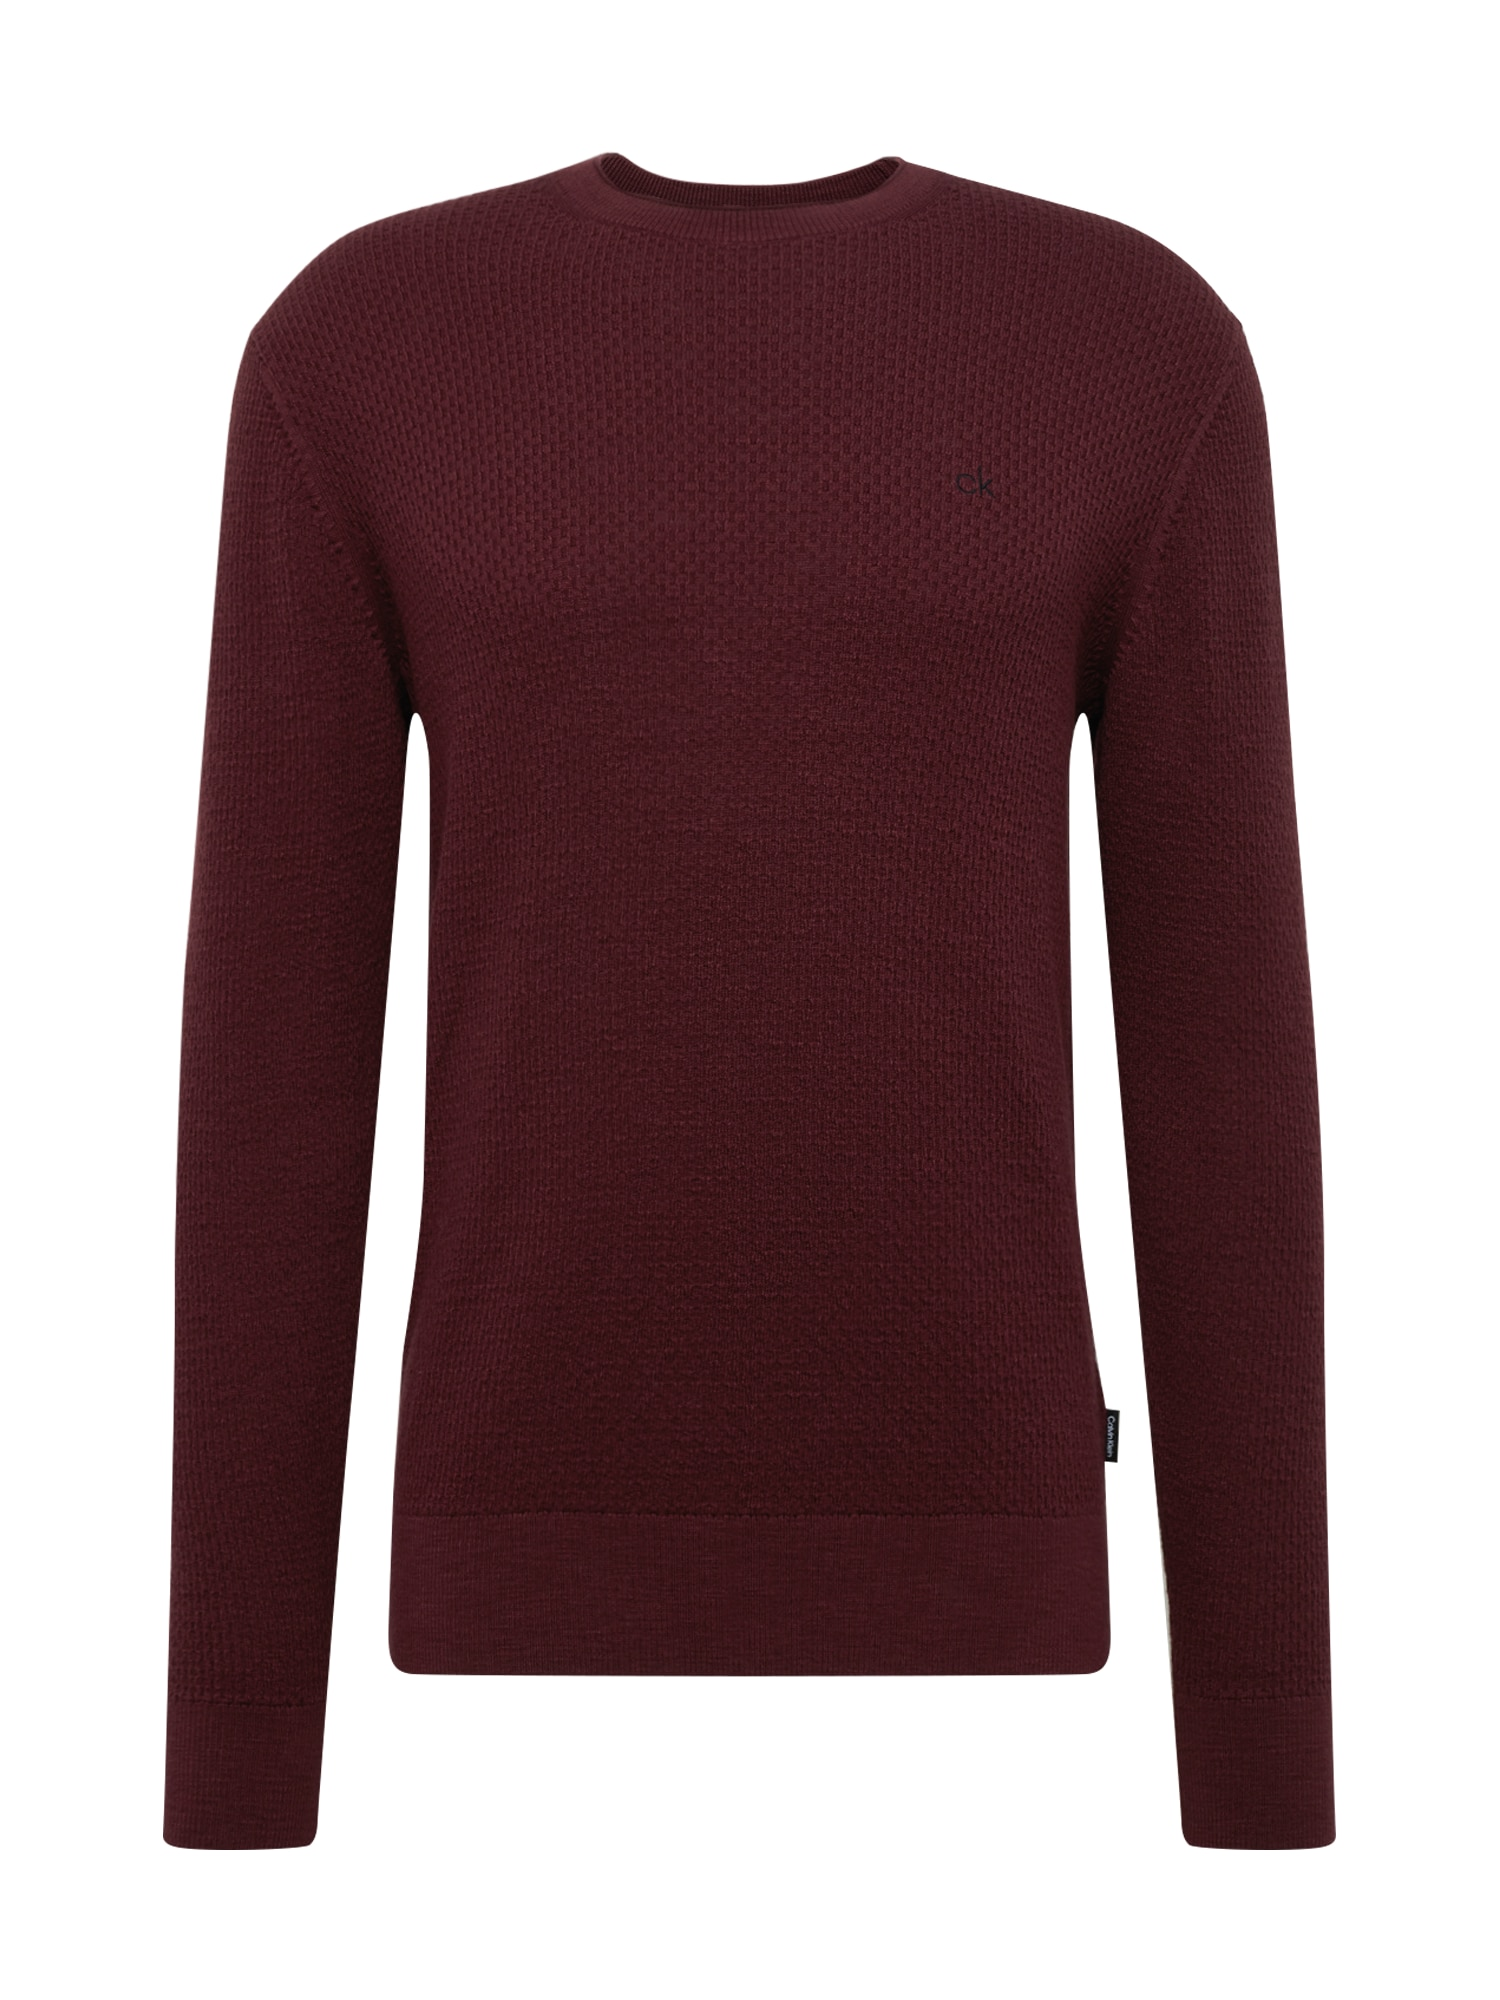 Calvin Klein Megztinis vyno raudona spalva